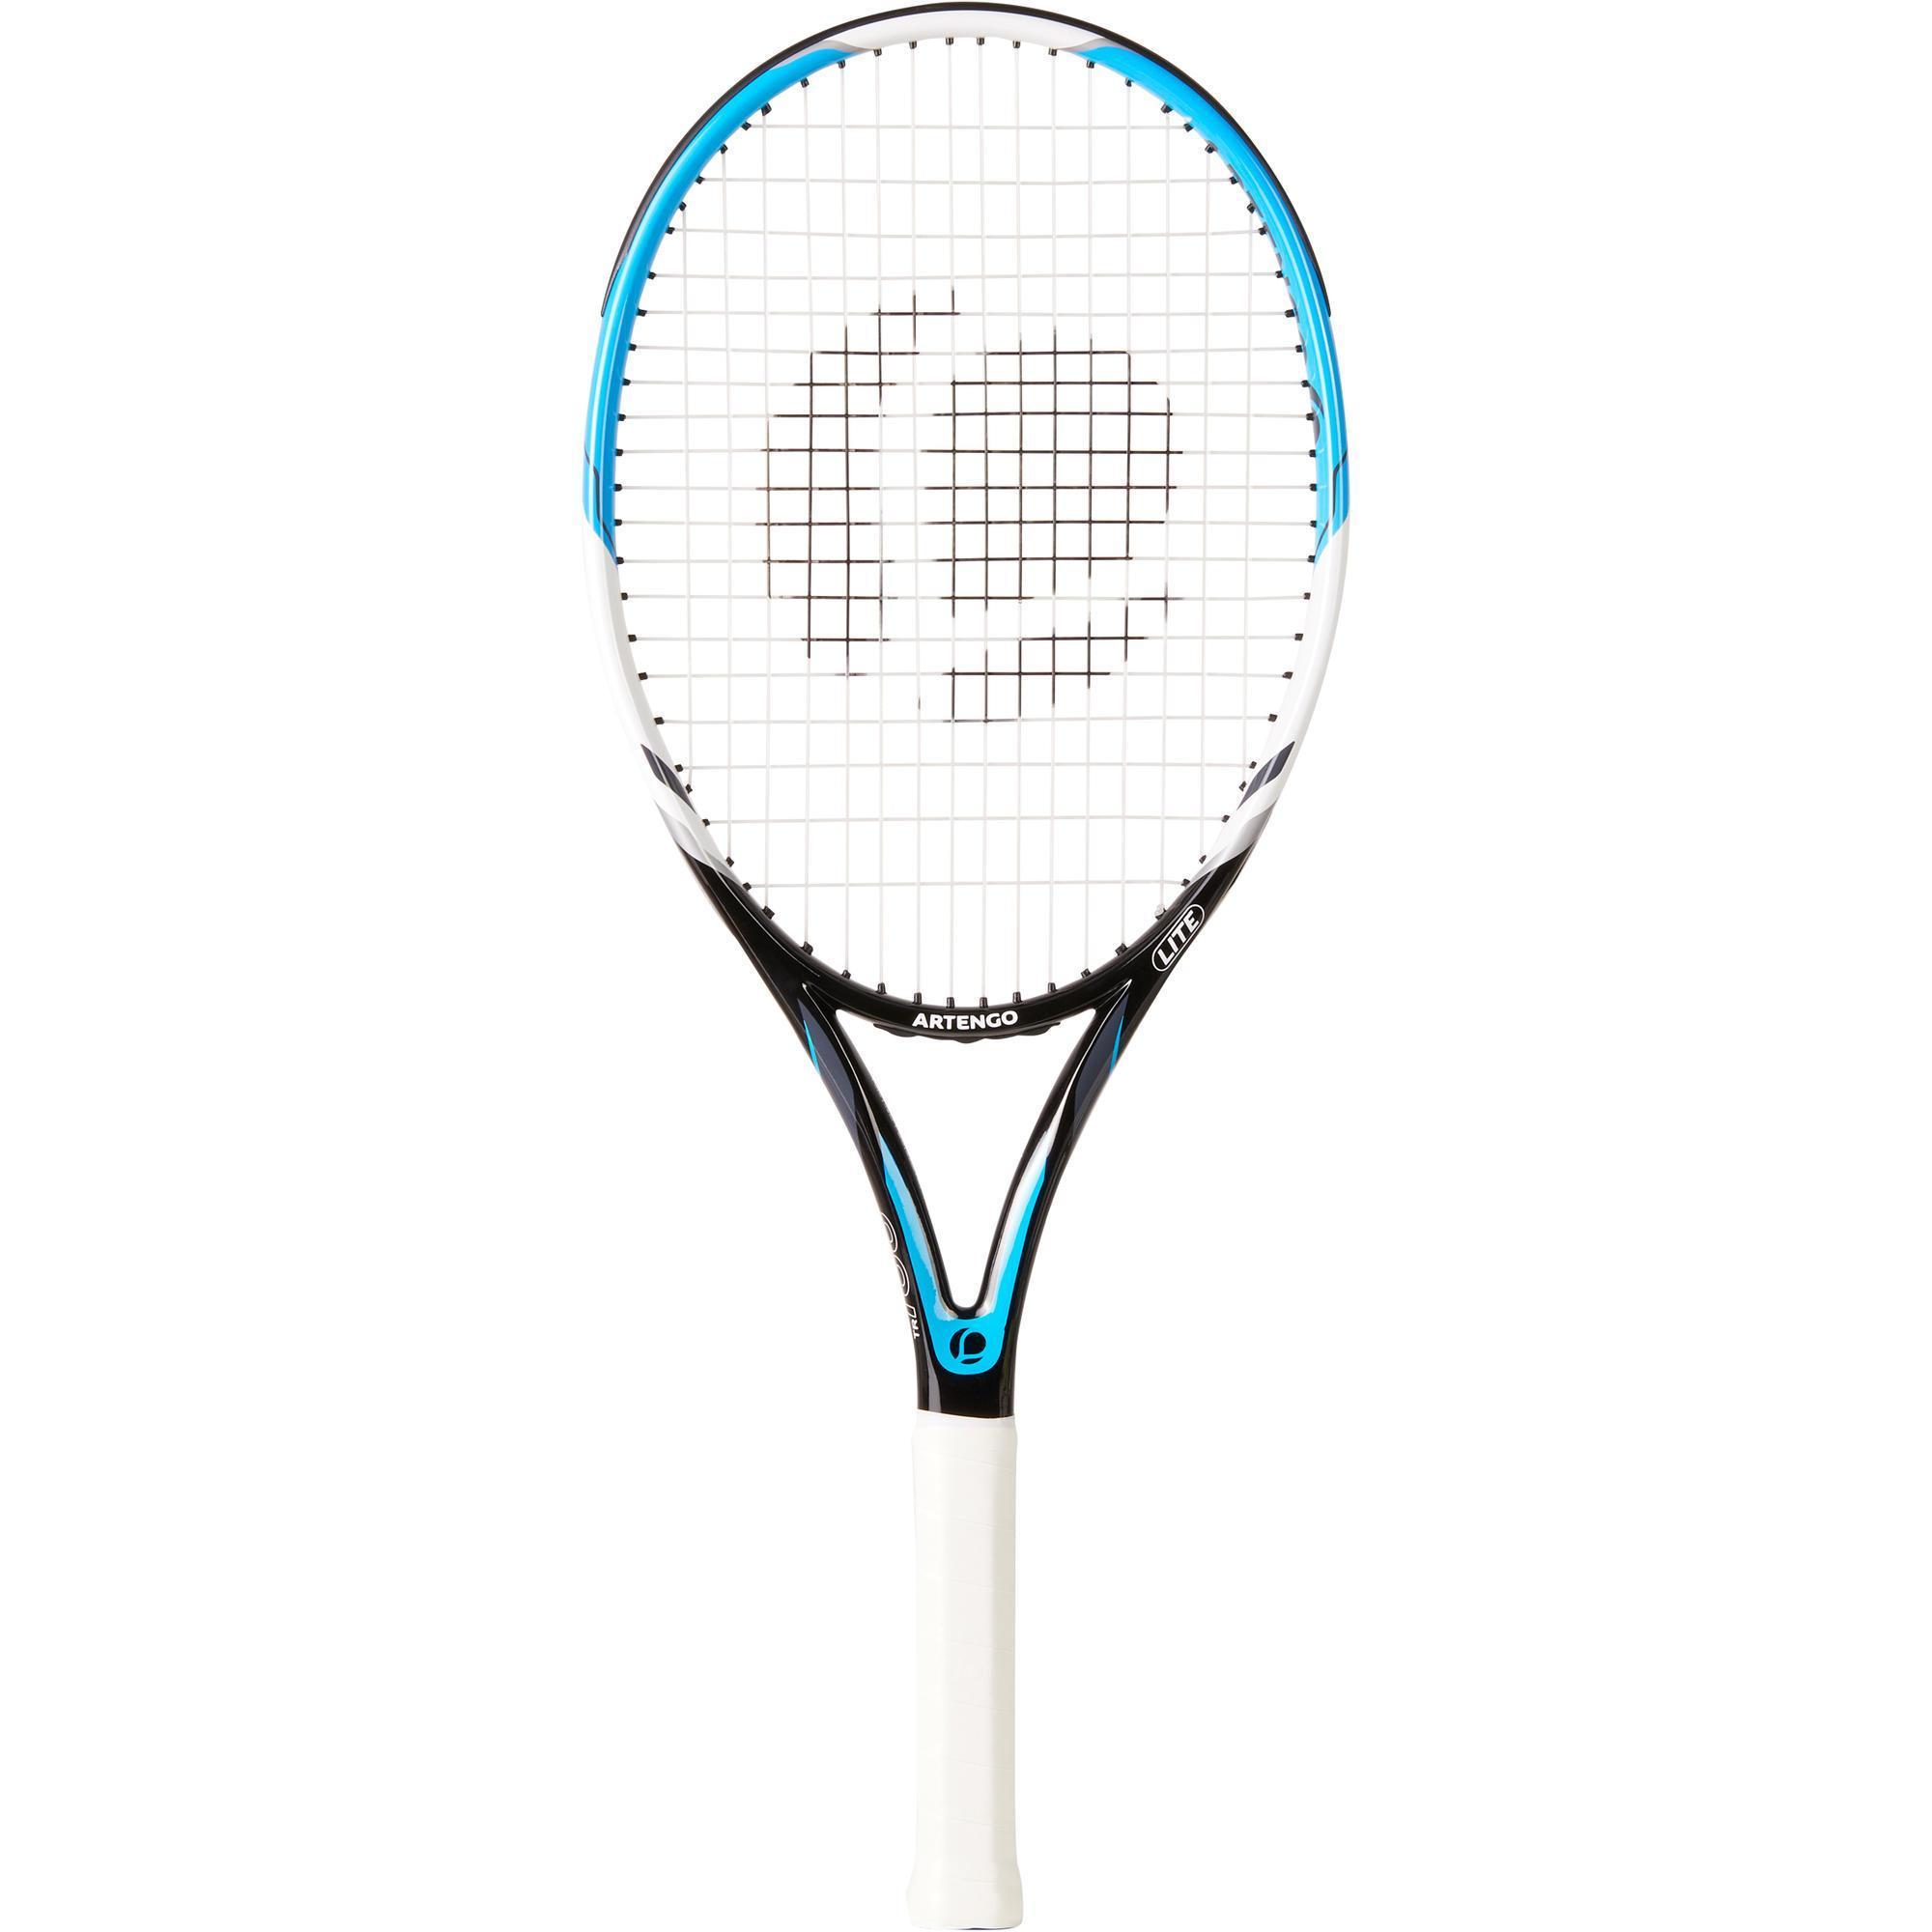 Adult Rackets Tr160 Lite Adult Tennis Racket Blue Artengo Decathlon